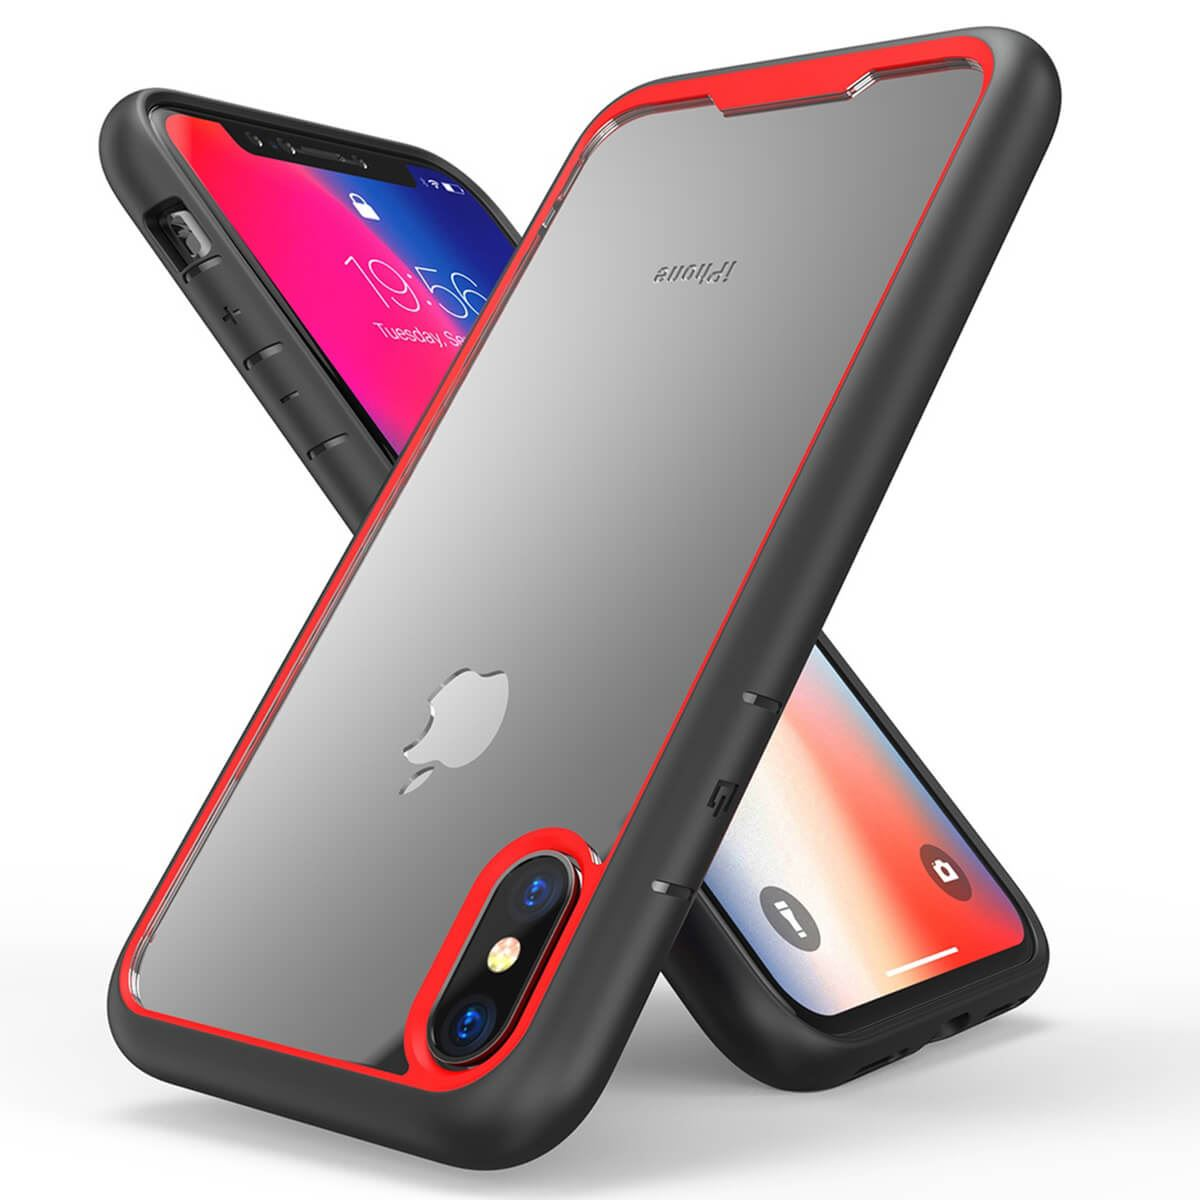 Shockproof-Bumper-Case-For-iPhone-X-XS-XR-6-Plus-7-Plus-6-Plus-Hard-Armor thumbnail 15